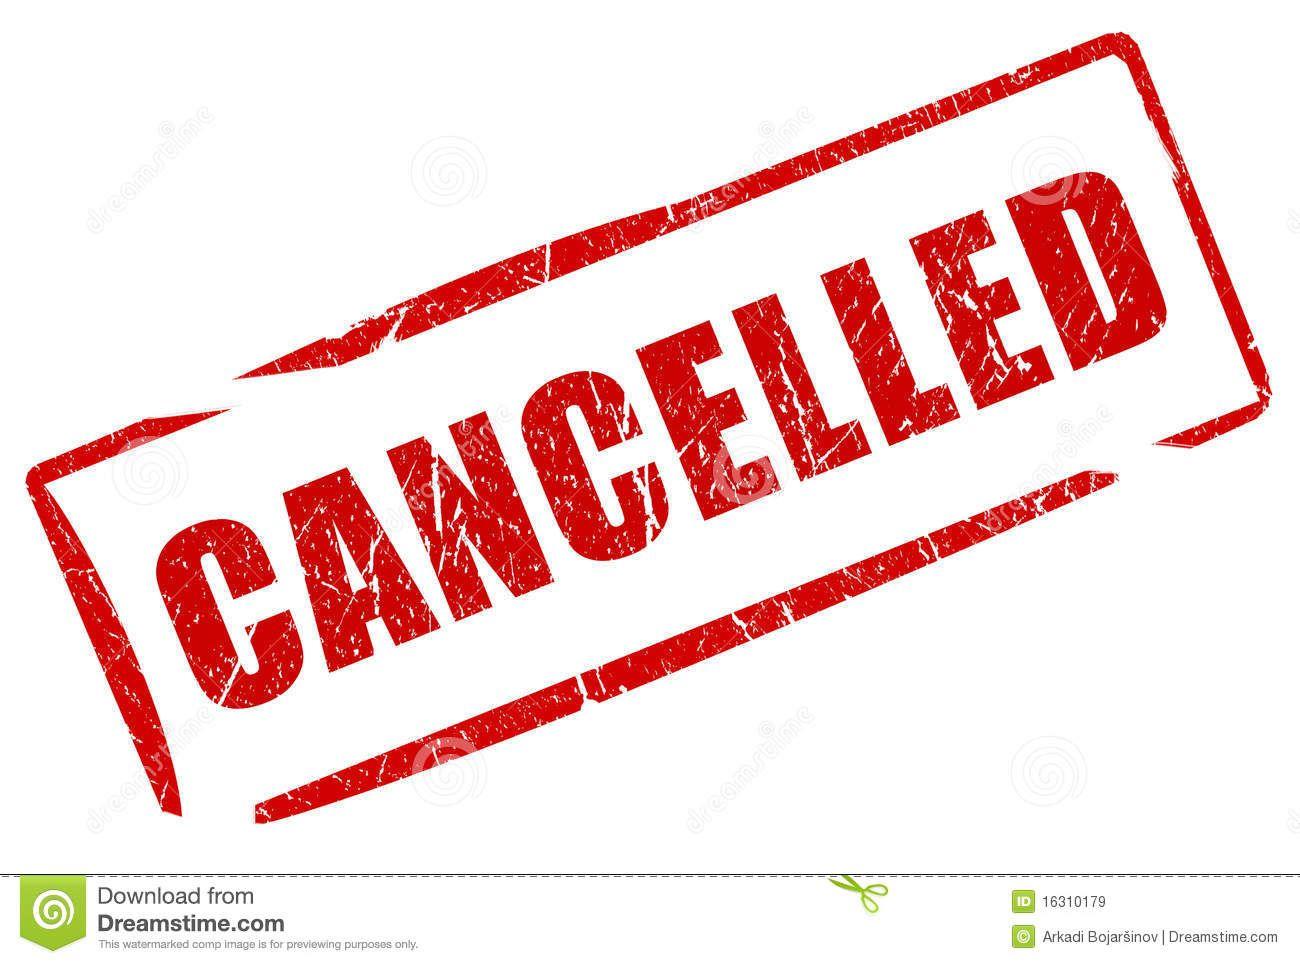 Cancelled stamp 16310179g 1300964 ap216 desenho cancelled stamp 16310179g 1300964 fandeluxe Images